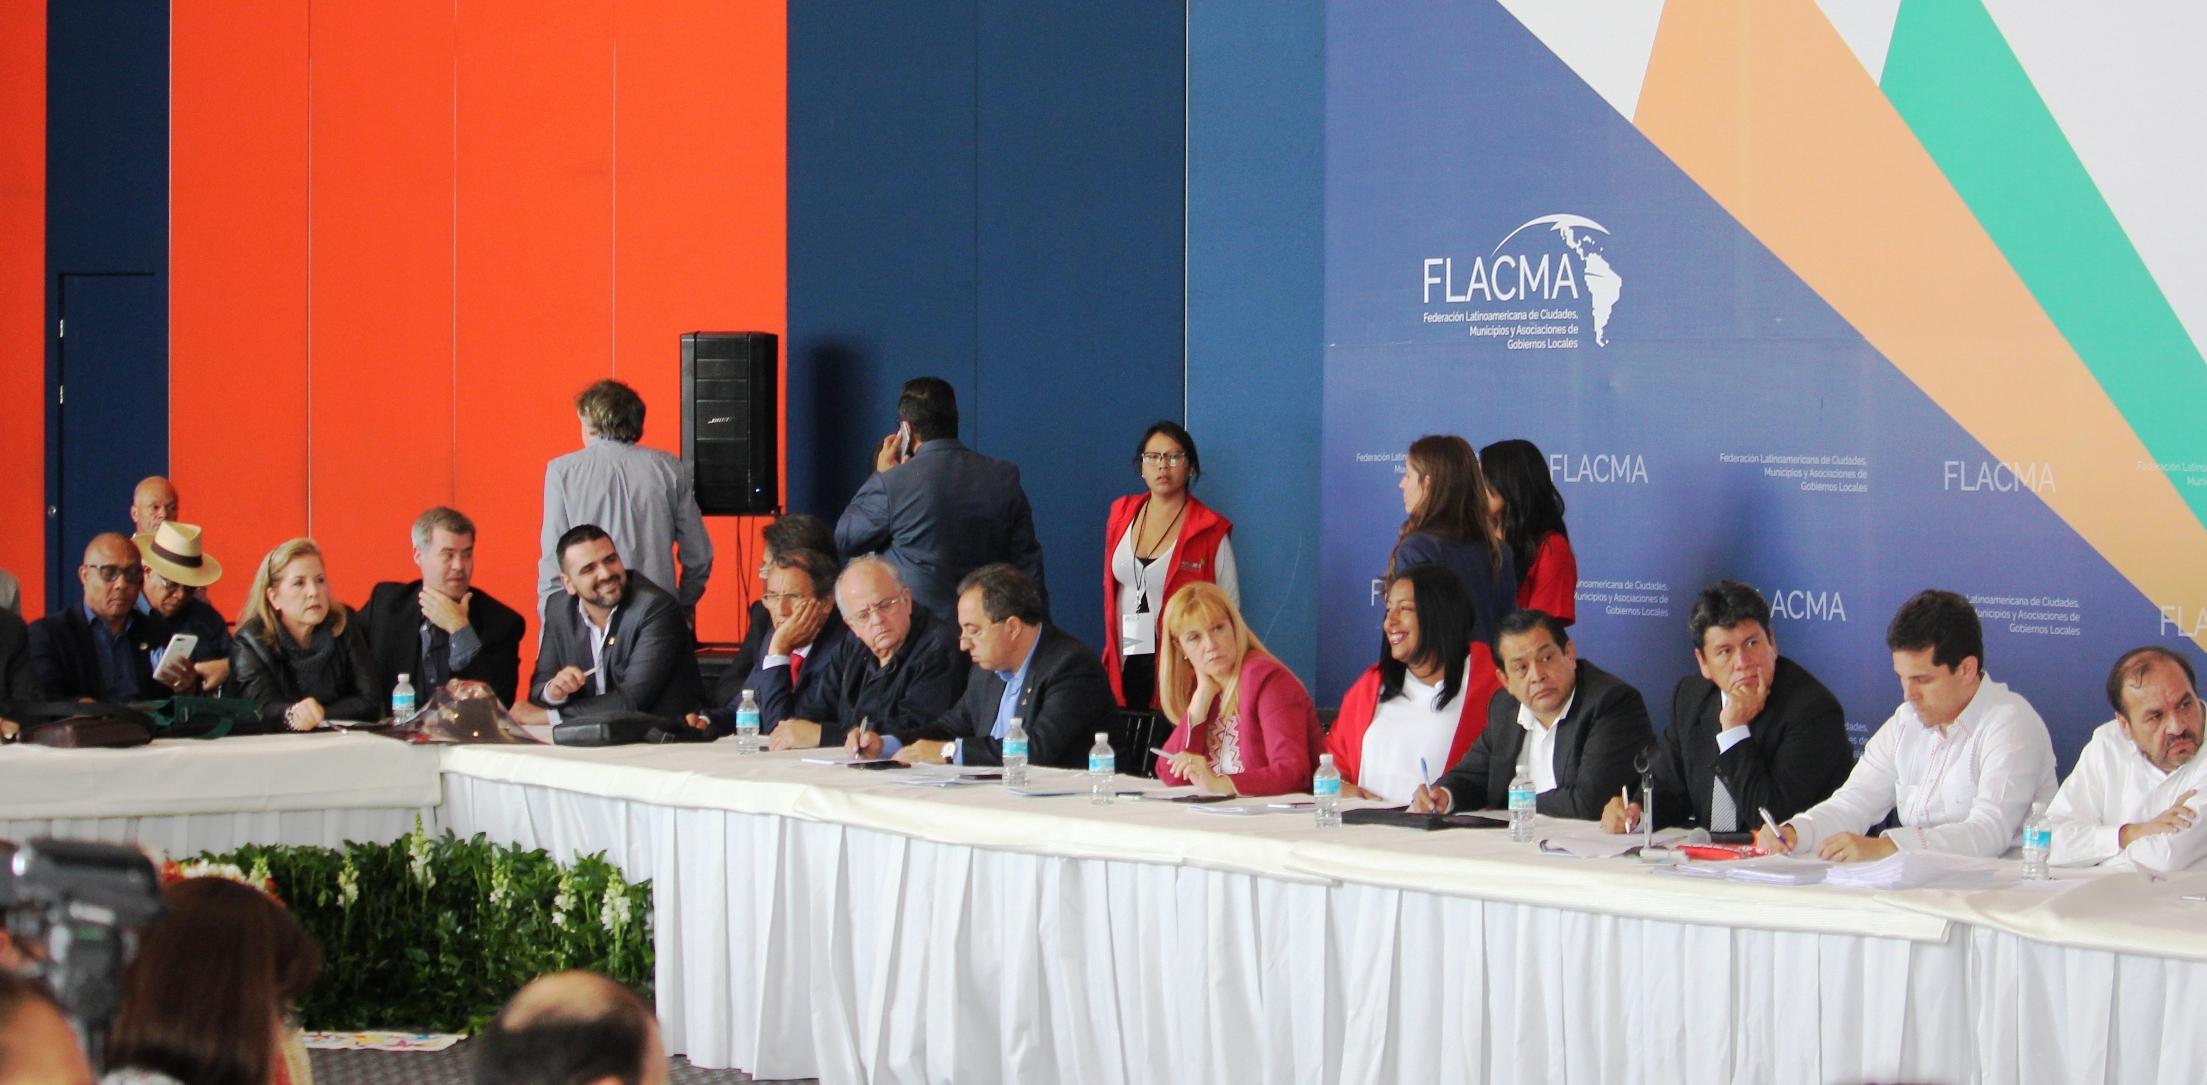 El intendente vuoto participa en mexico de la cumbre for Cabine del lago vuoto